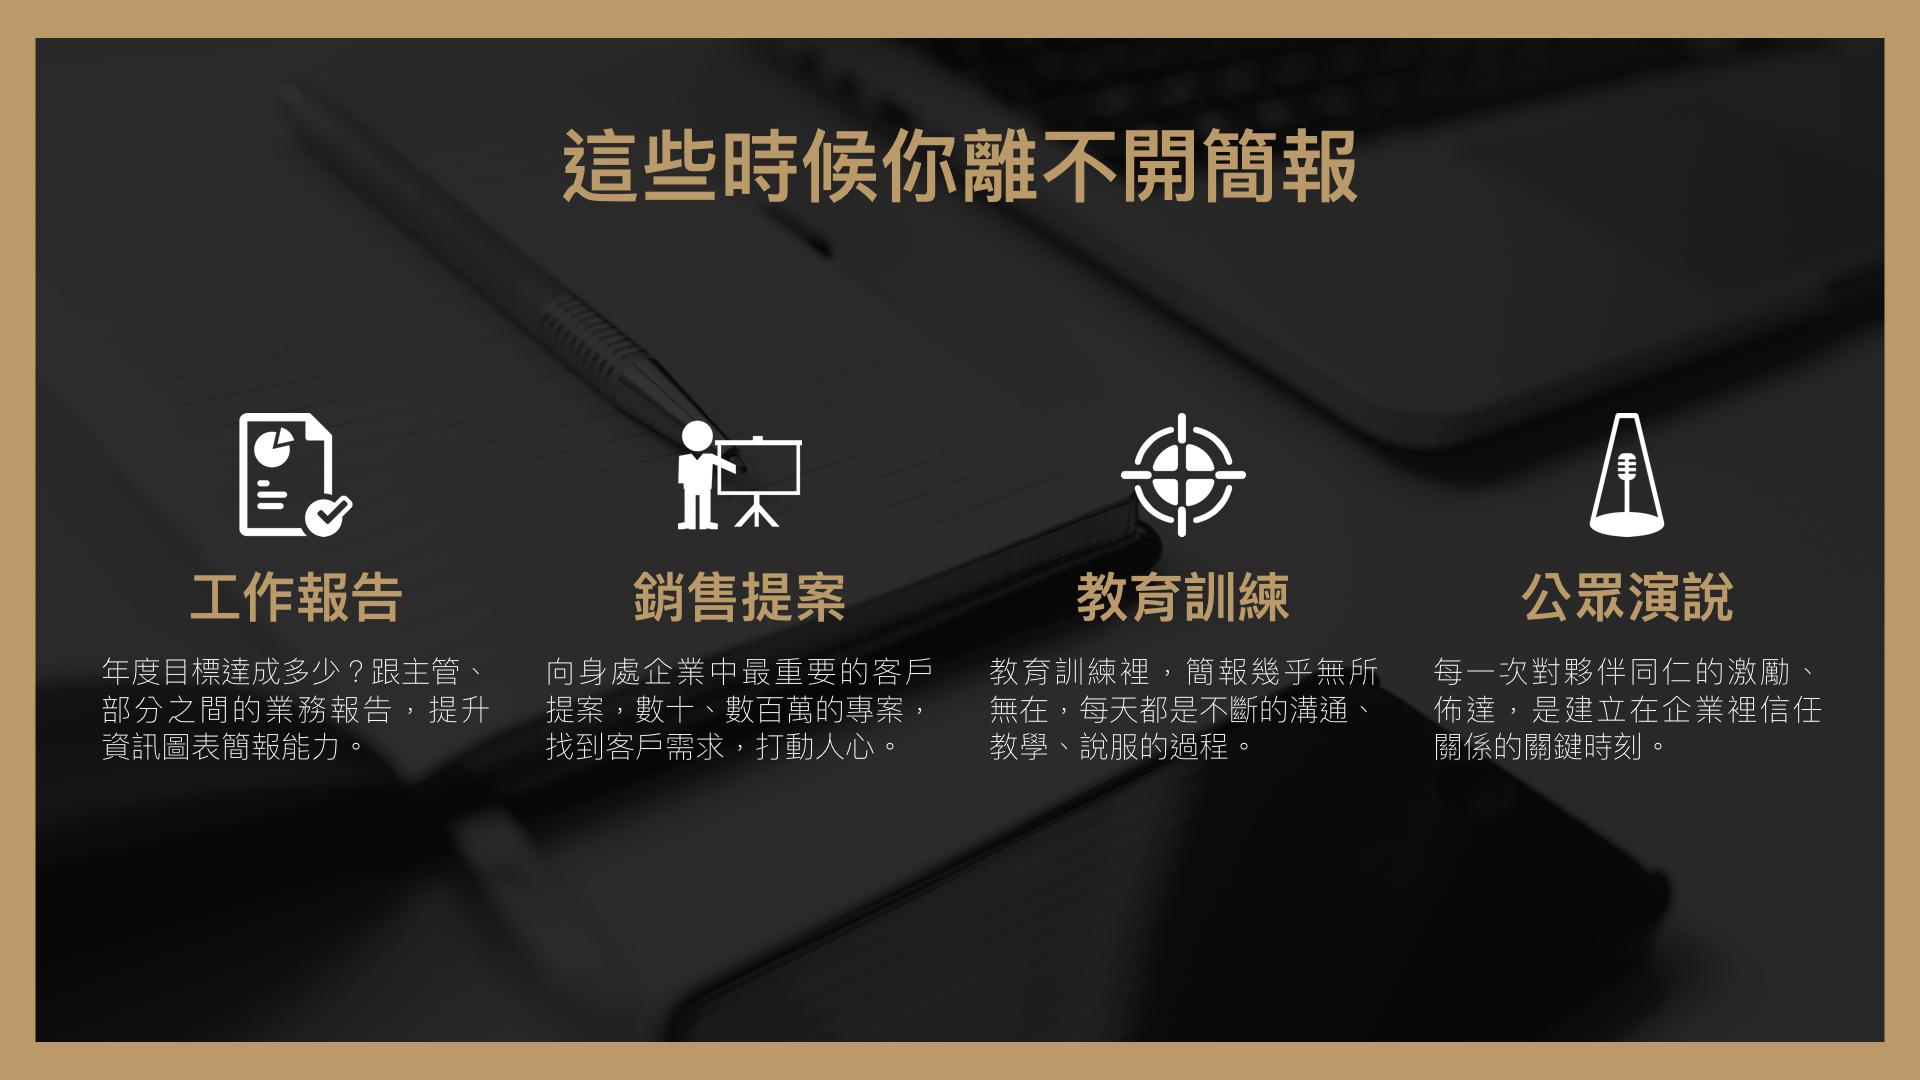 BFAcademy #5 林大班 周震宇.006.jpeg